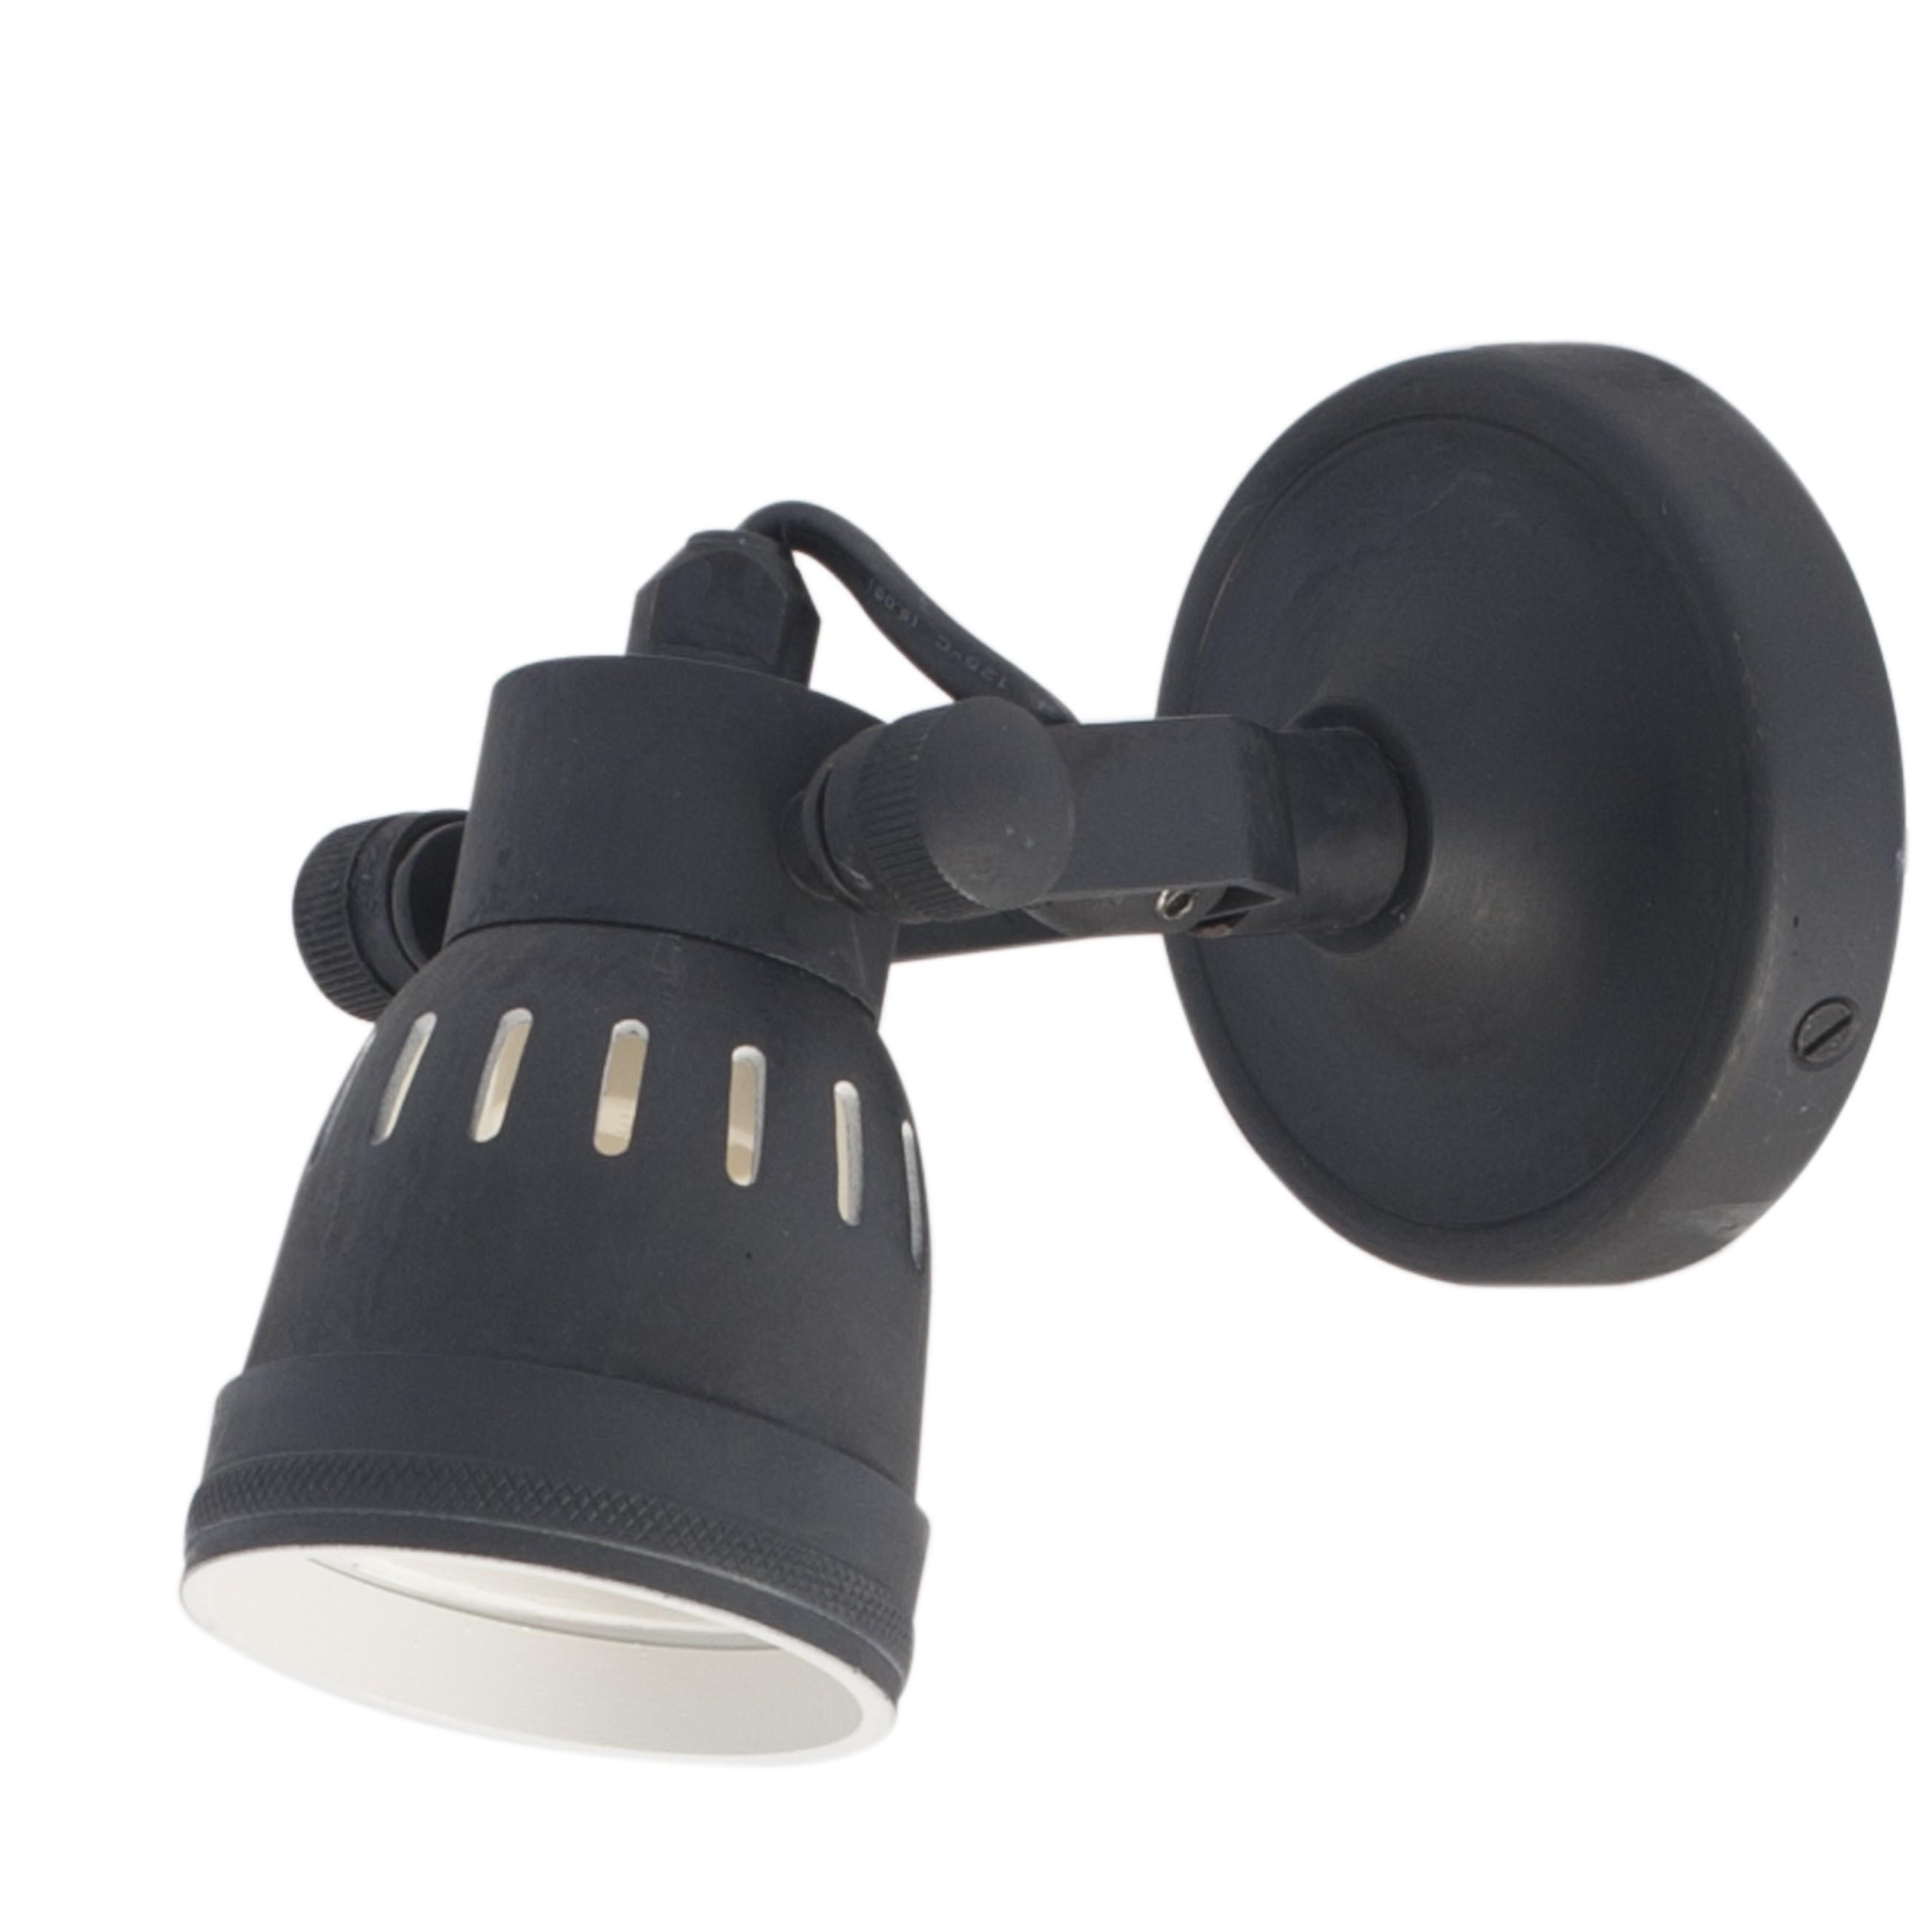 Stoere Keuken Kopen : Klein Wandlampje online kopen in antiek zwarte kleur